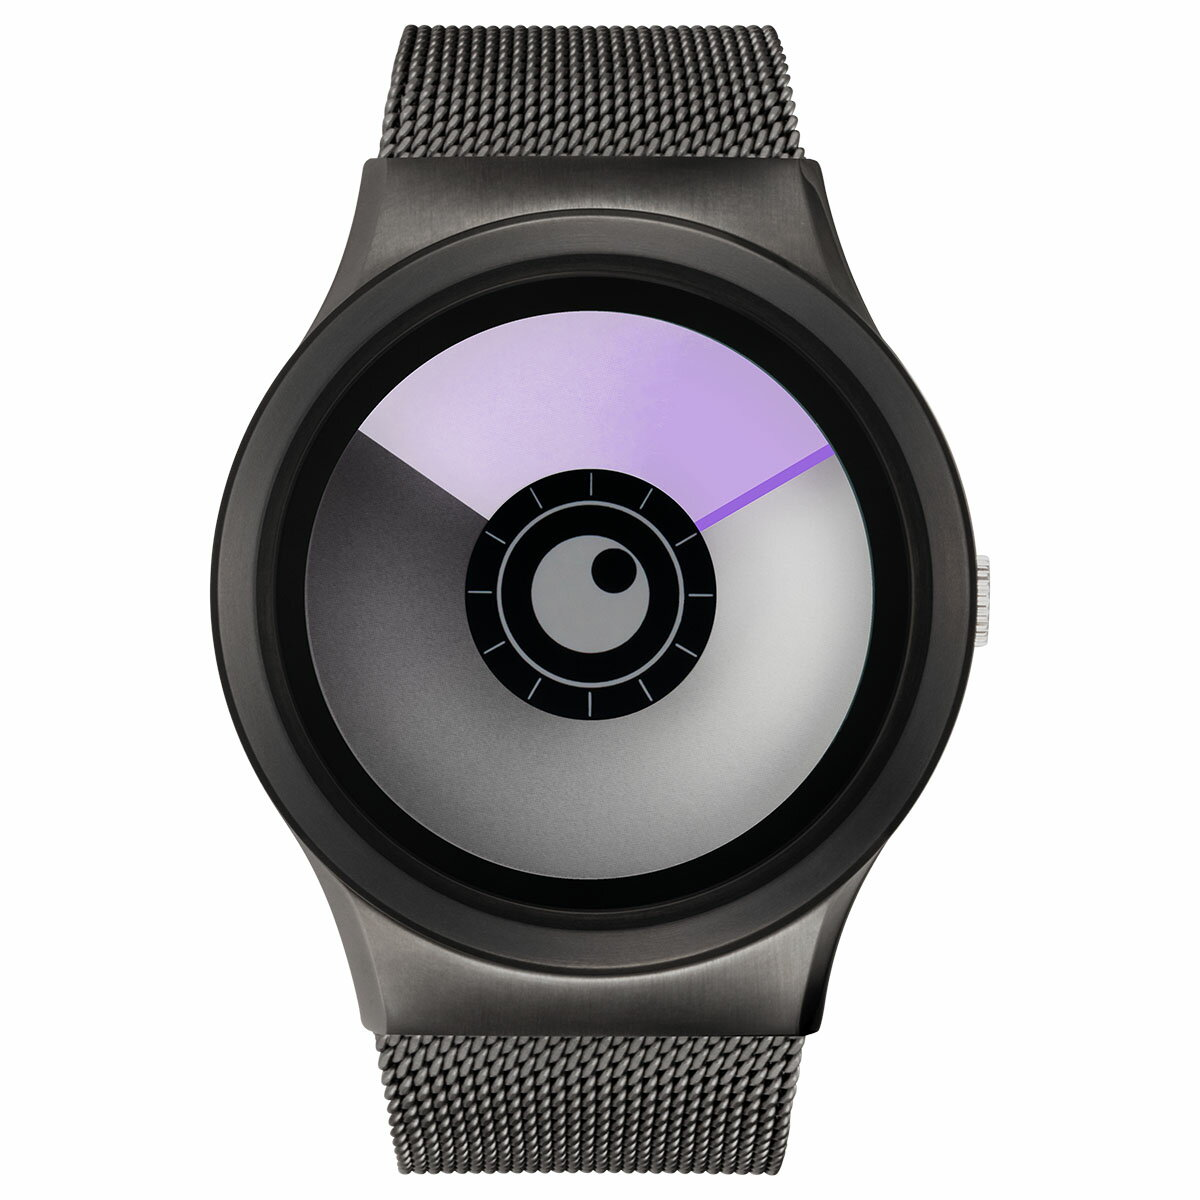 ZEROO AURORA BOREALIS ゼロ 電池式クォーツ 腕時計 [W12023B02SM02] パープル デザインウォッチ ペア用 メンズ レディース ユニセックス おしゃれ時計 デザイナーズ